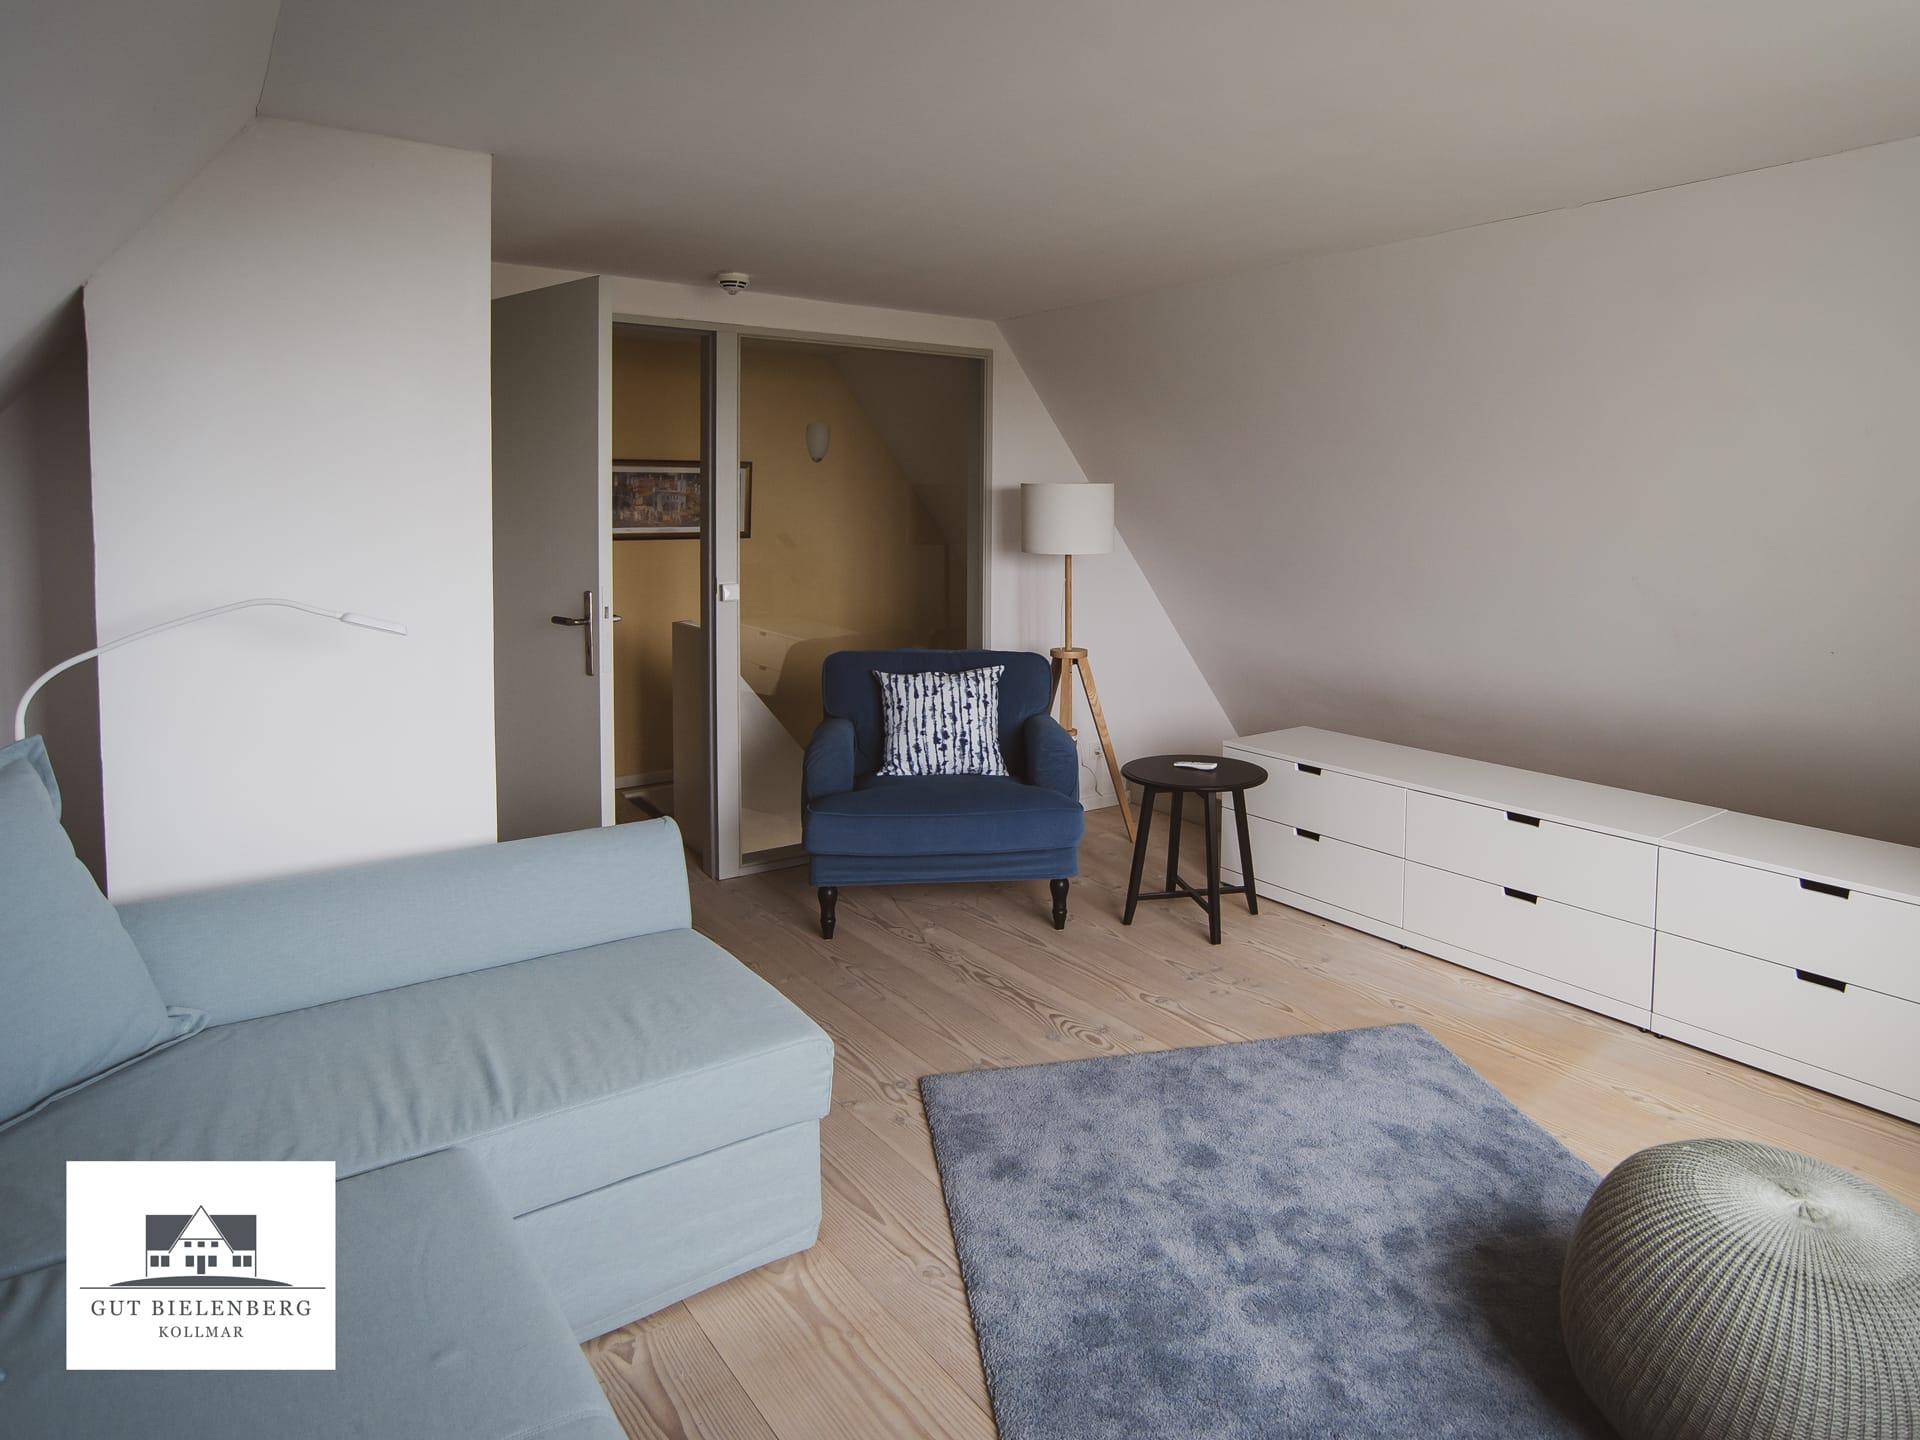 Gut Bielenberg - Suite Elbblick